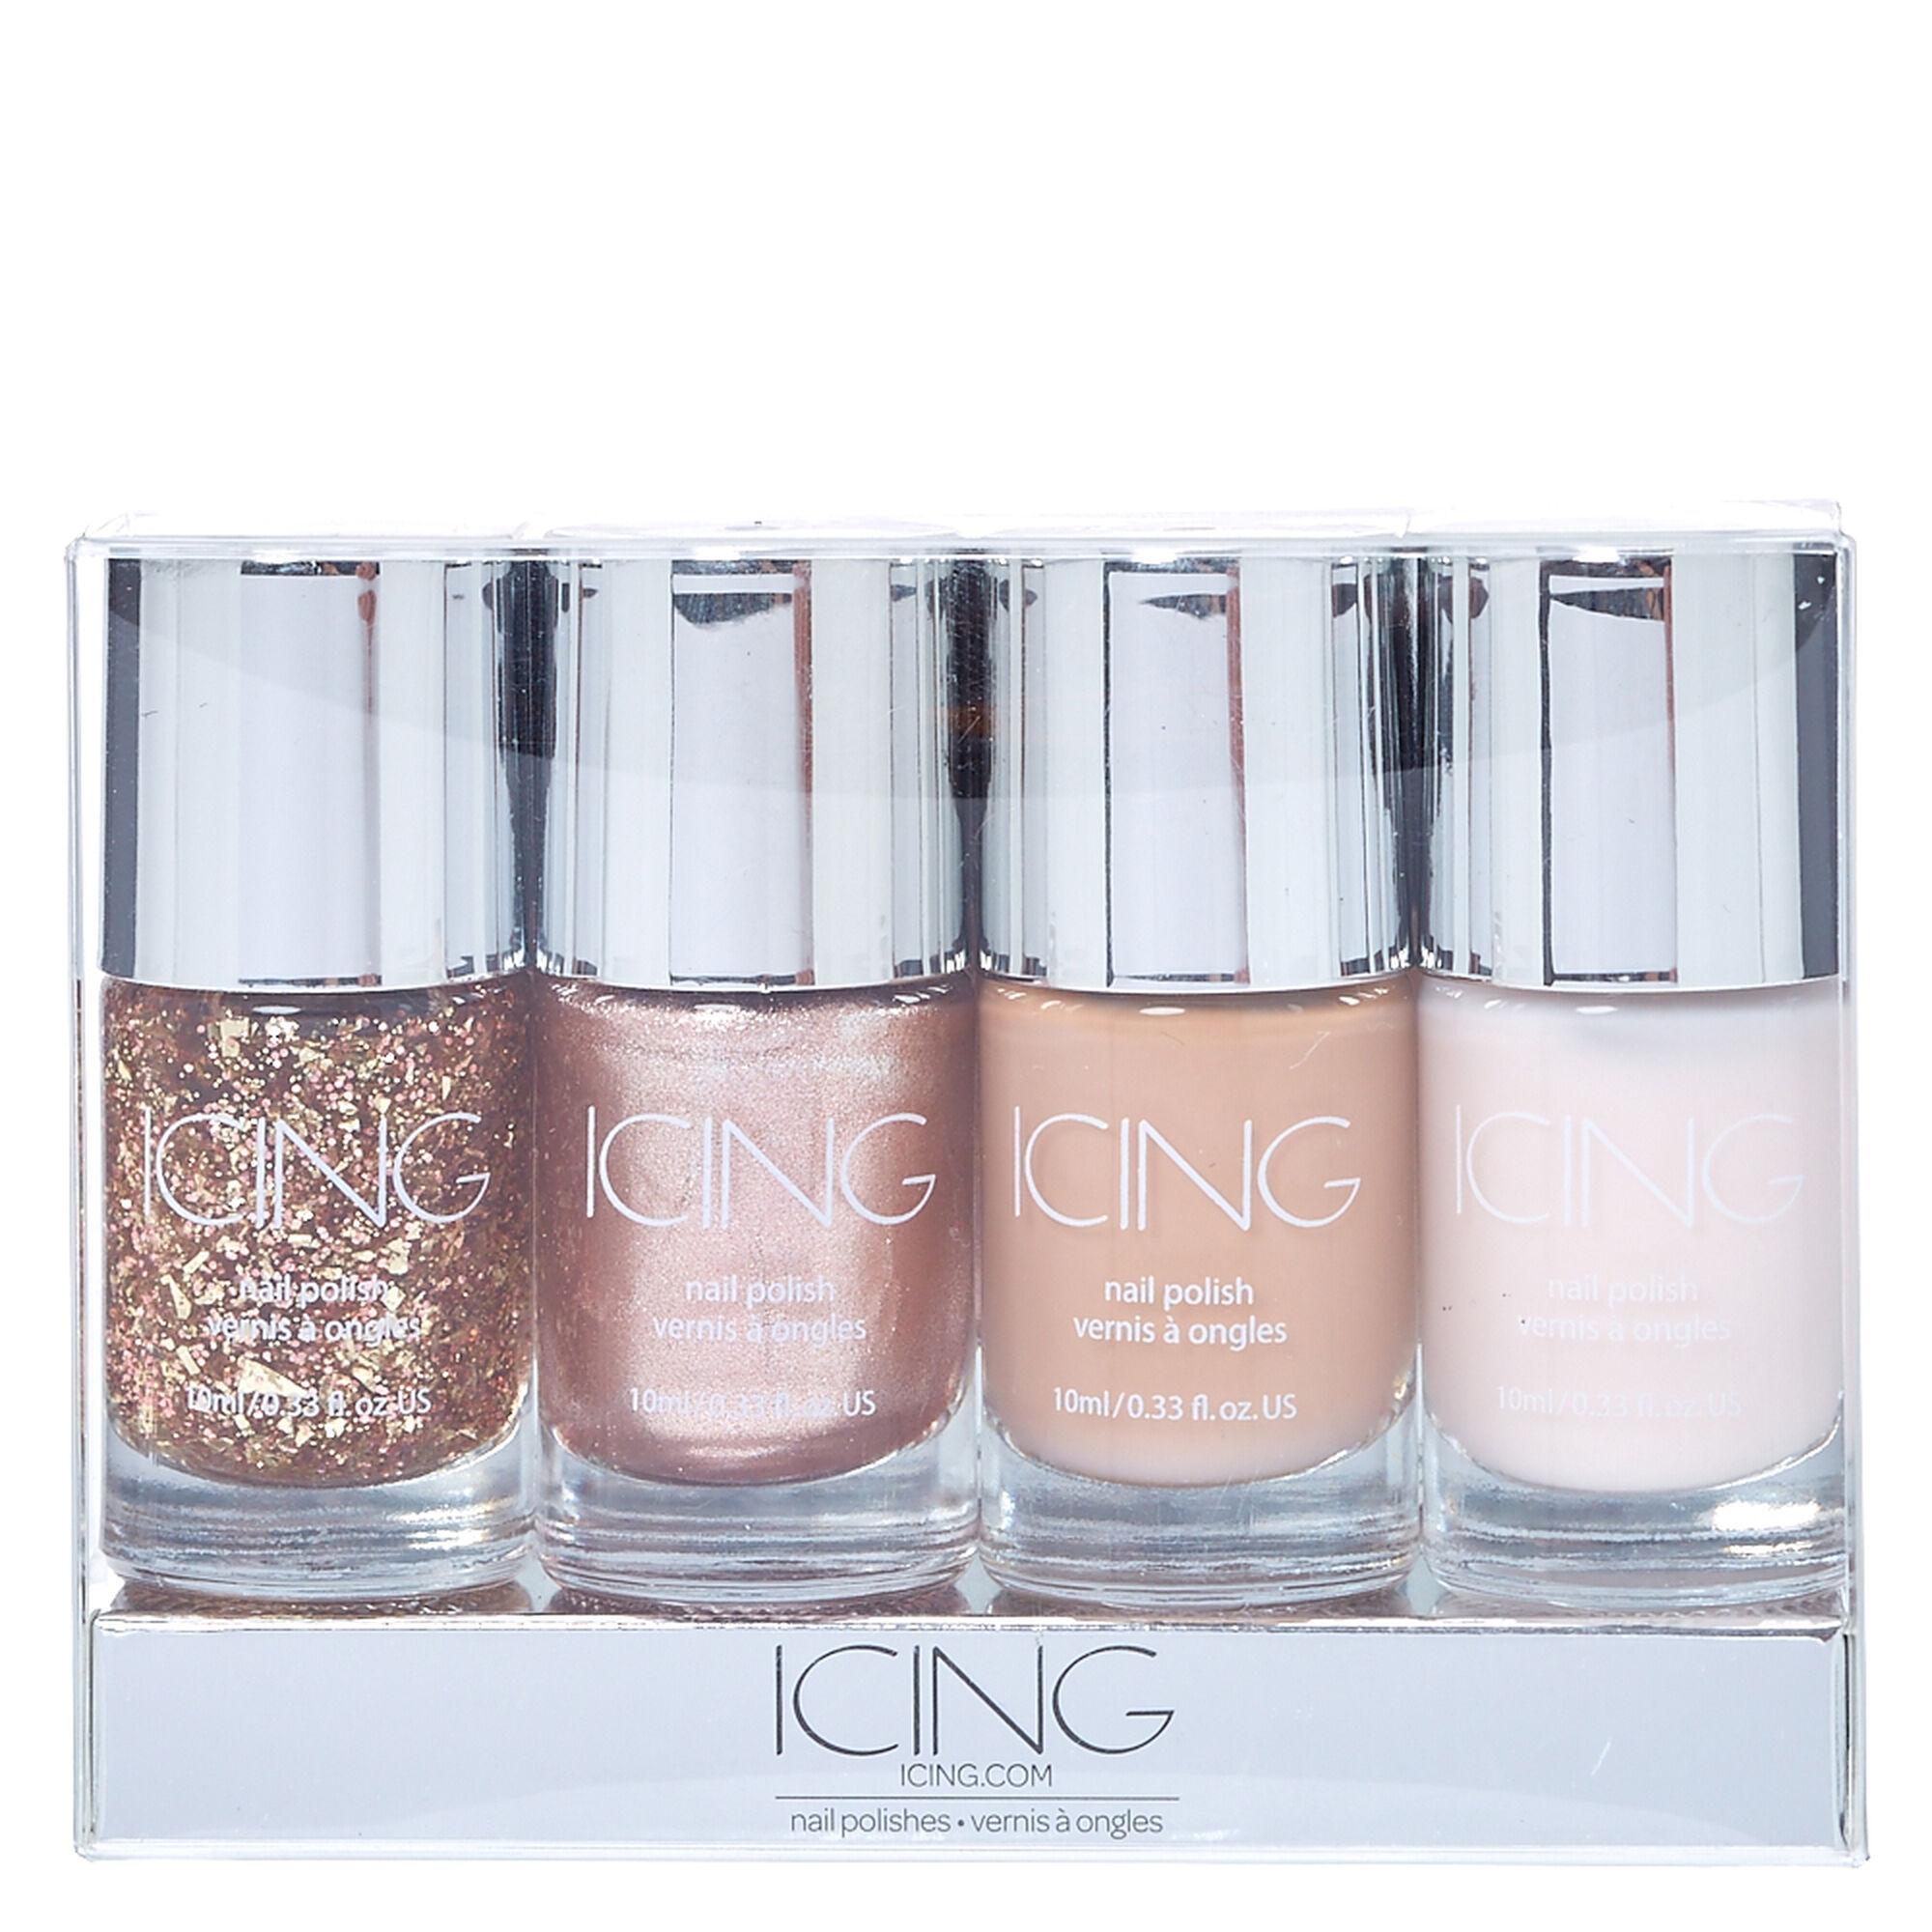 Nude Glitter 4 Pack Nail Polish Set | Icing US